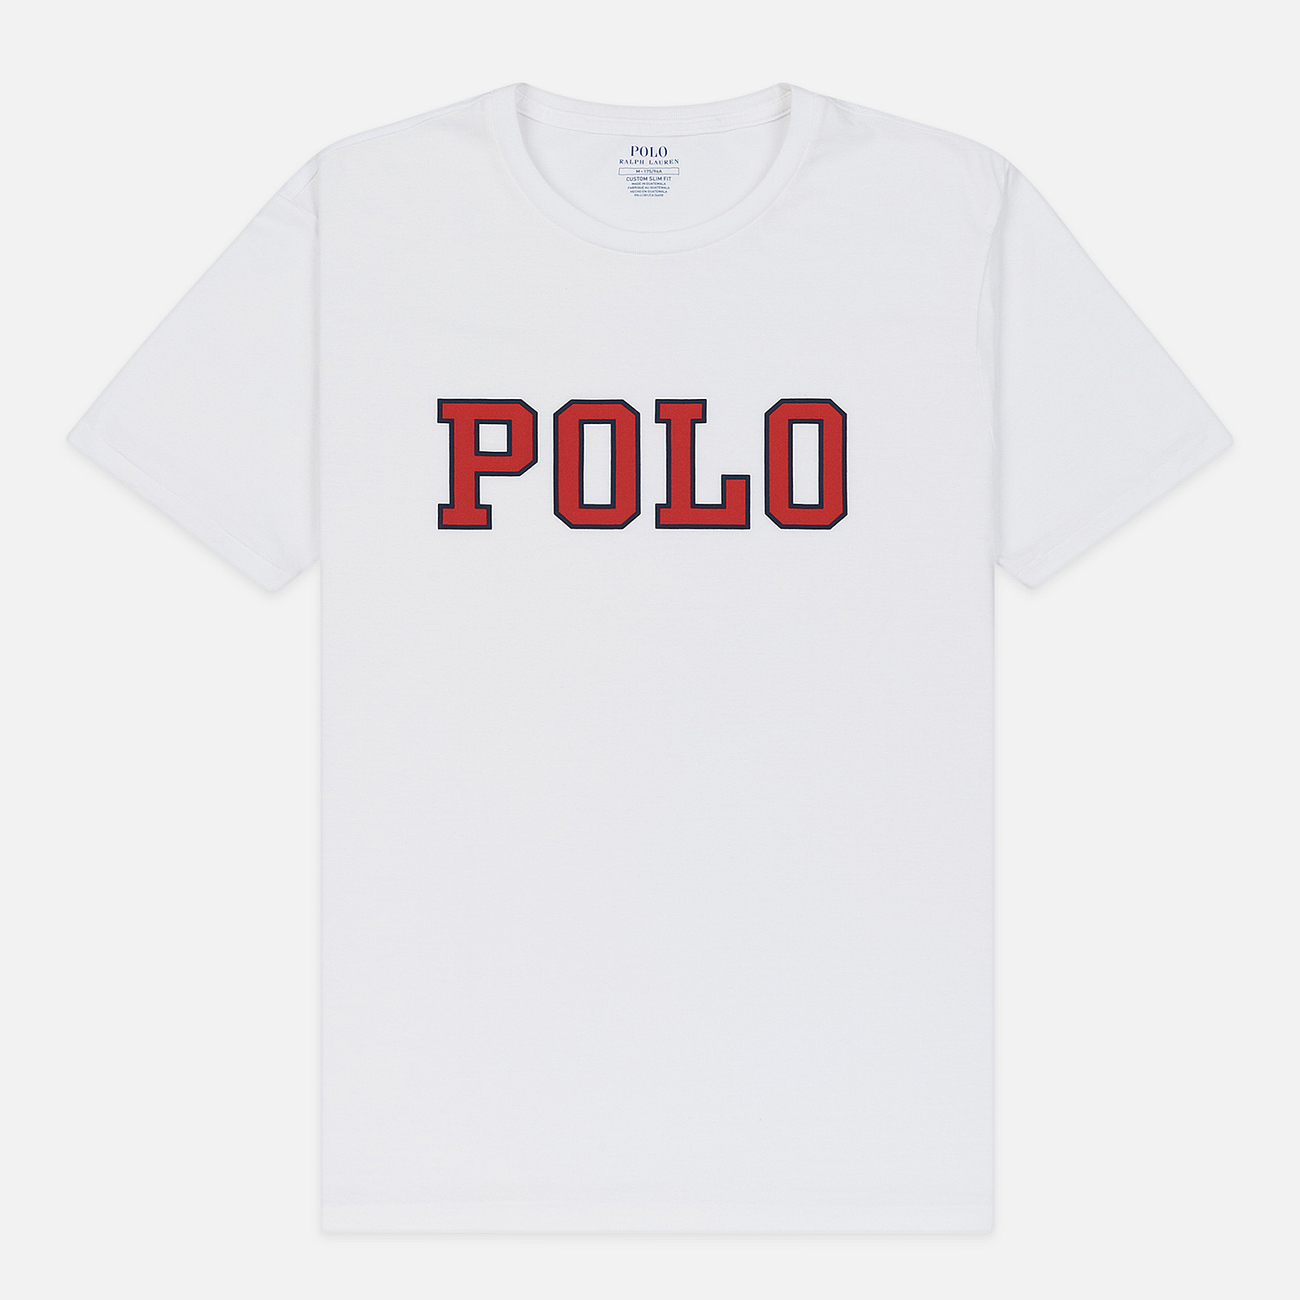 Мужская футболка Polo Ralph Lauren Polo Printed White